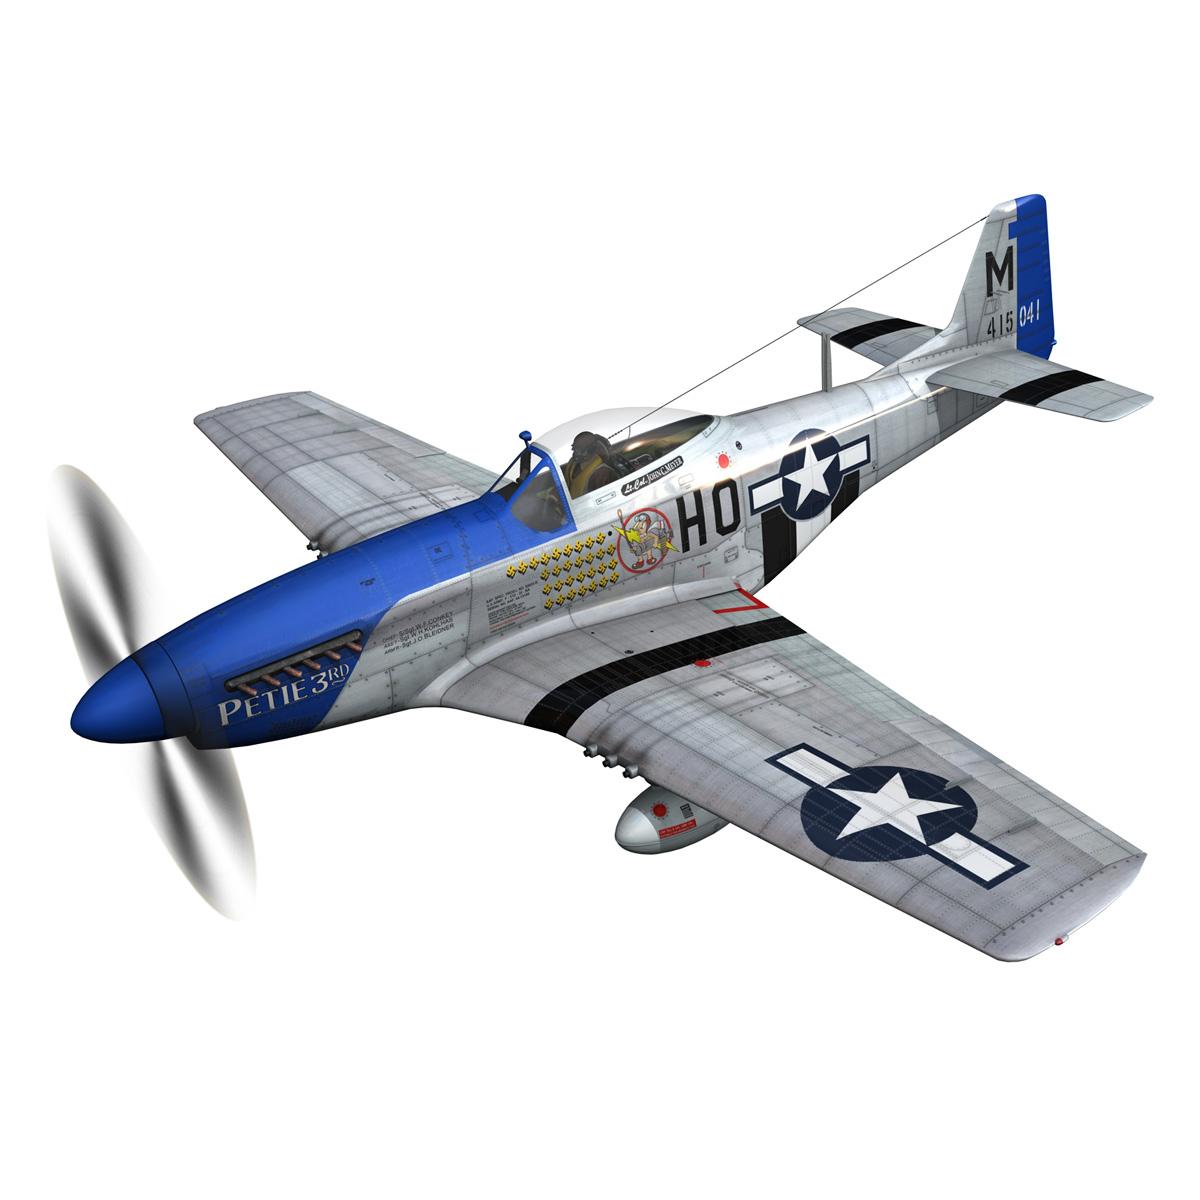 north american p-51d mustang – petie 3rd 3d model fbx c4d lwo obj 280129